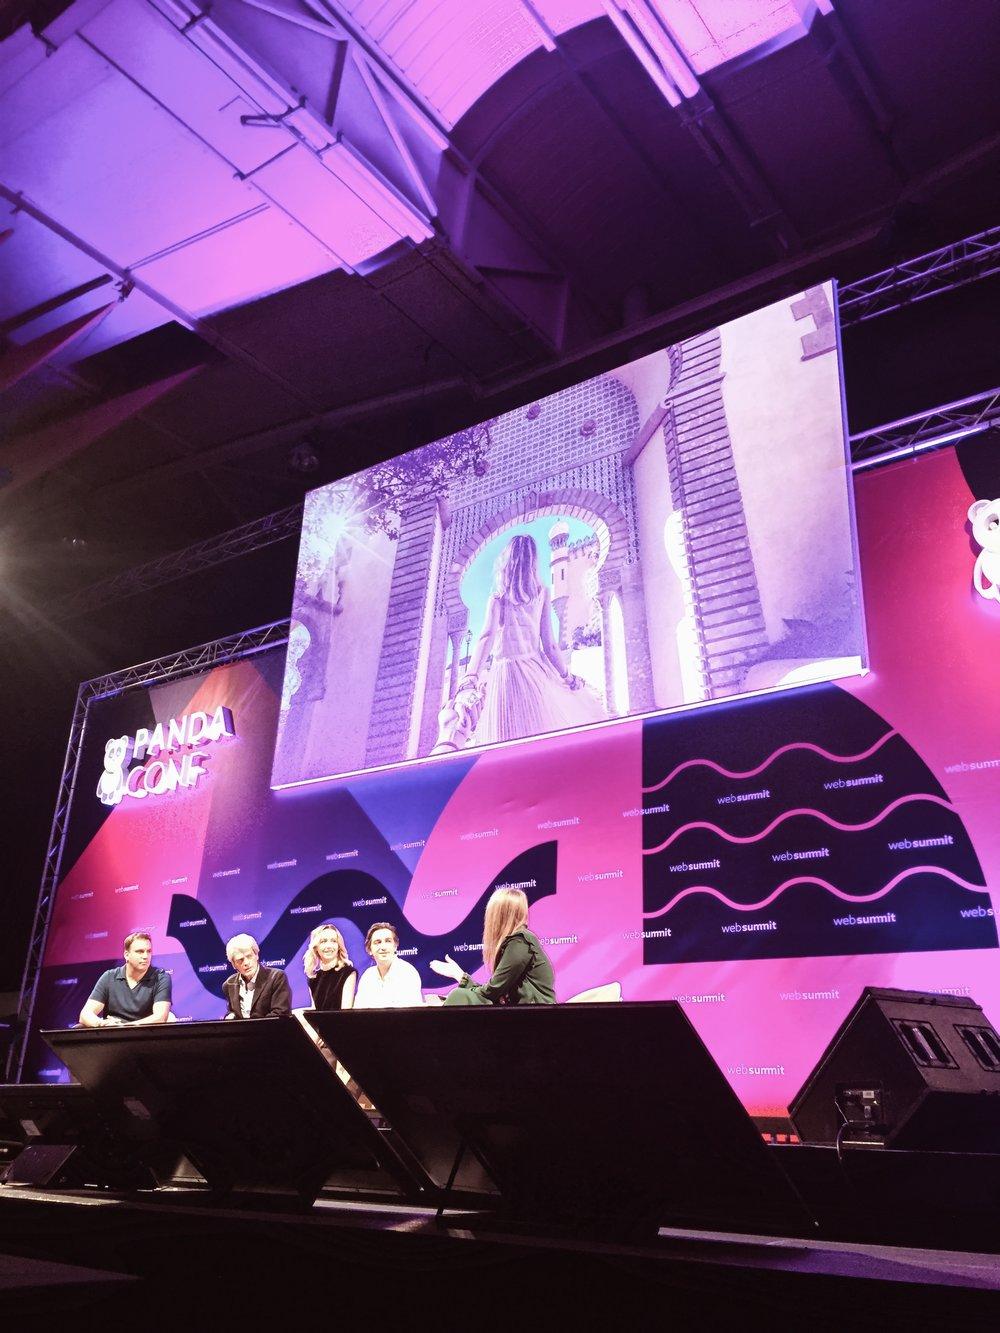 Web-summit-lisbon-20174.JPG